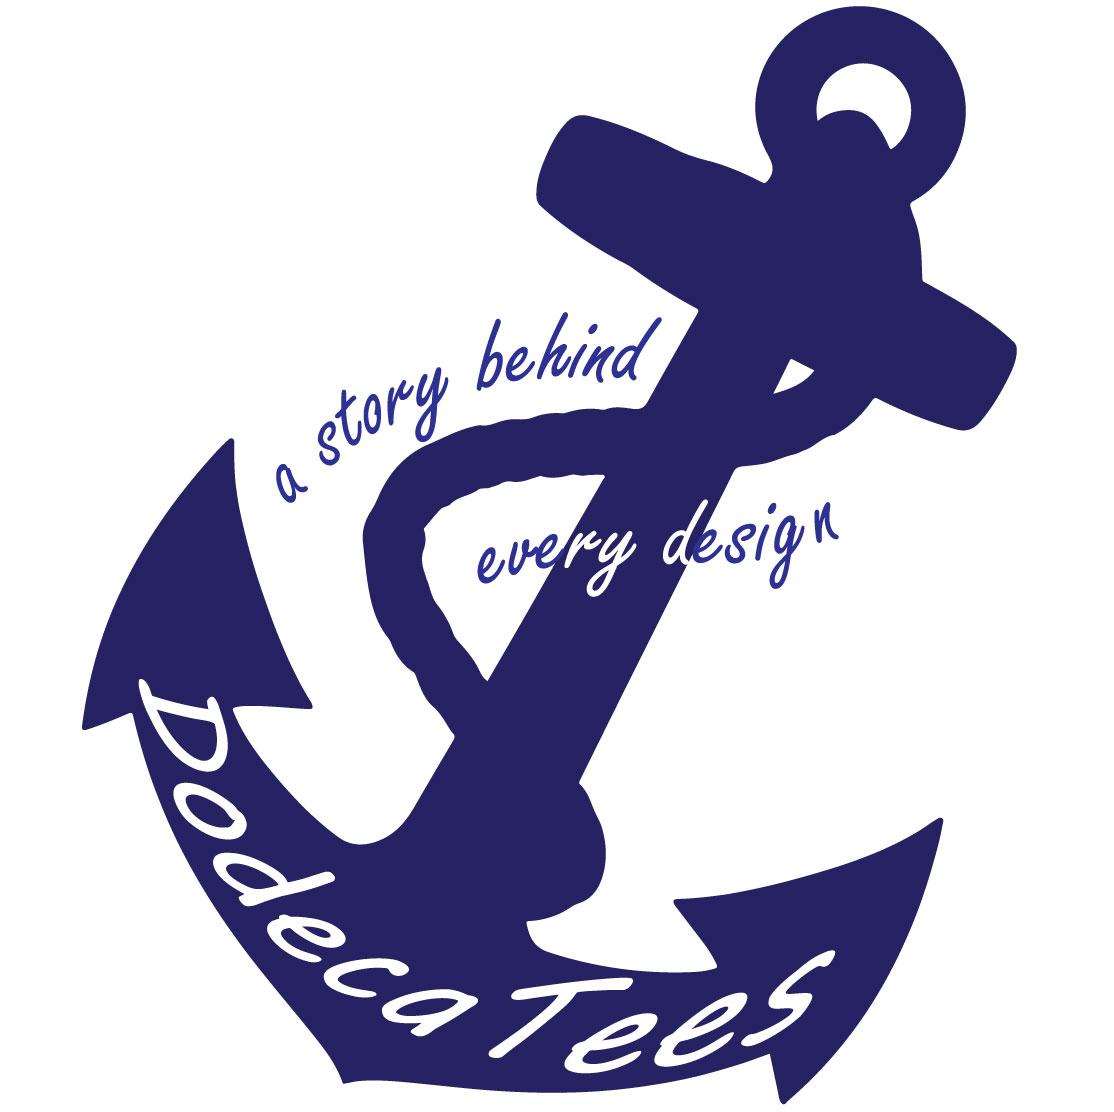 75 Anchor Christian Symbol Of Hope Hope Anchor Christian Of Symbol